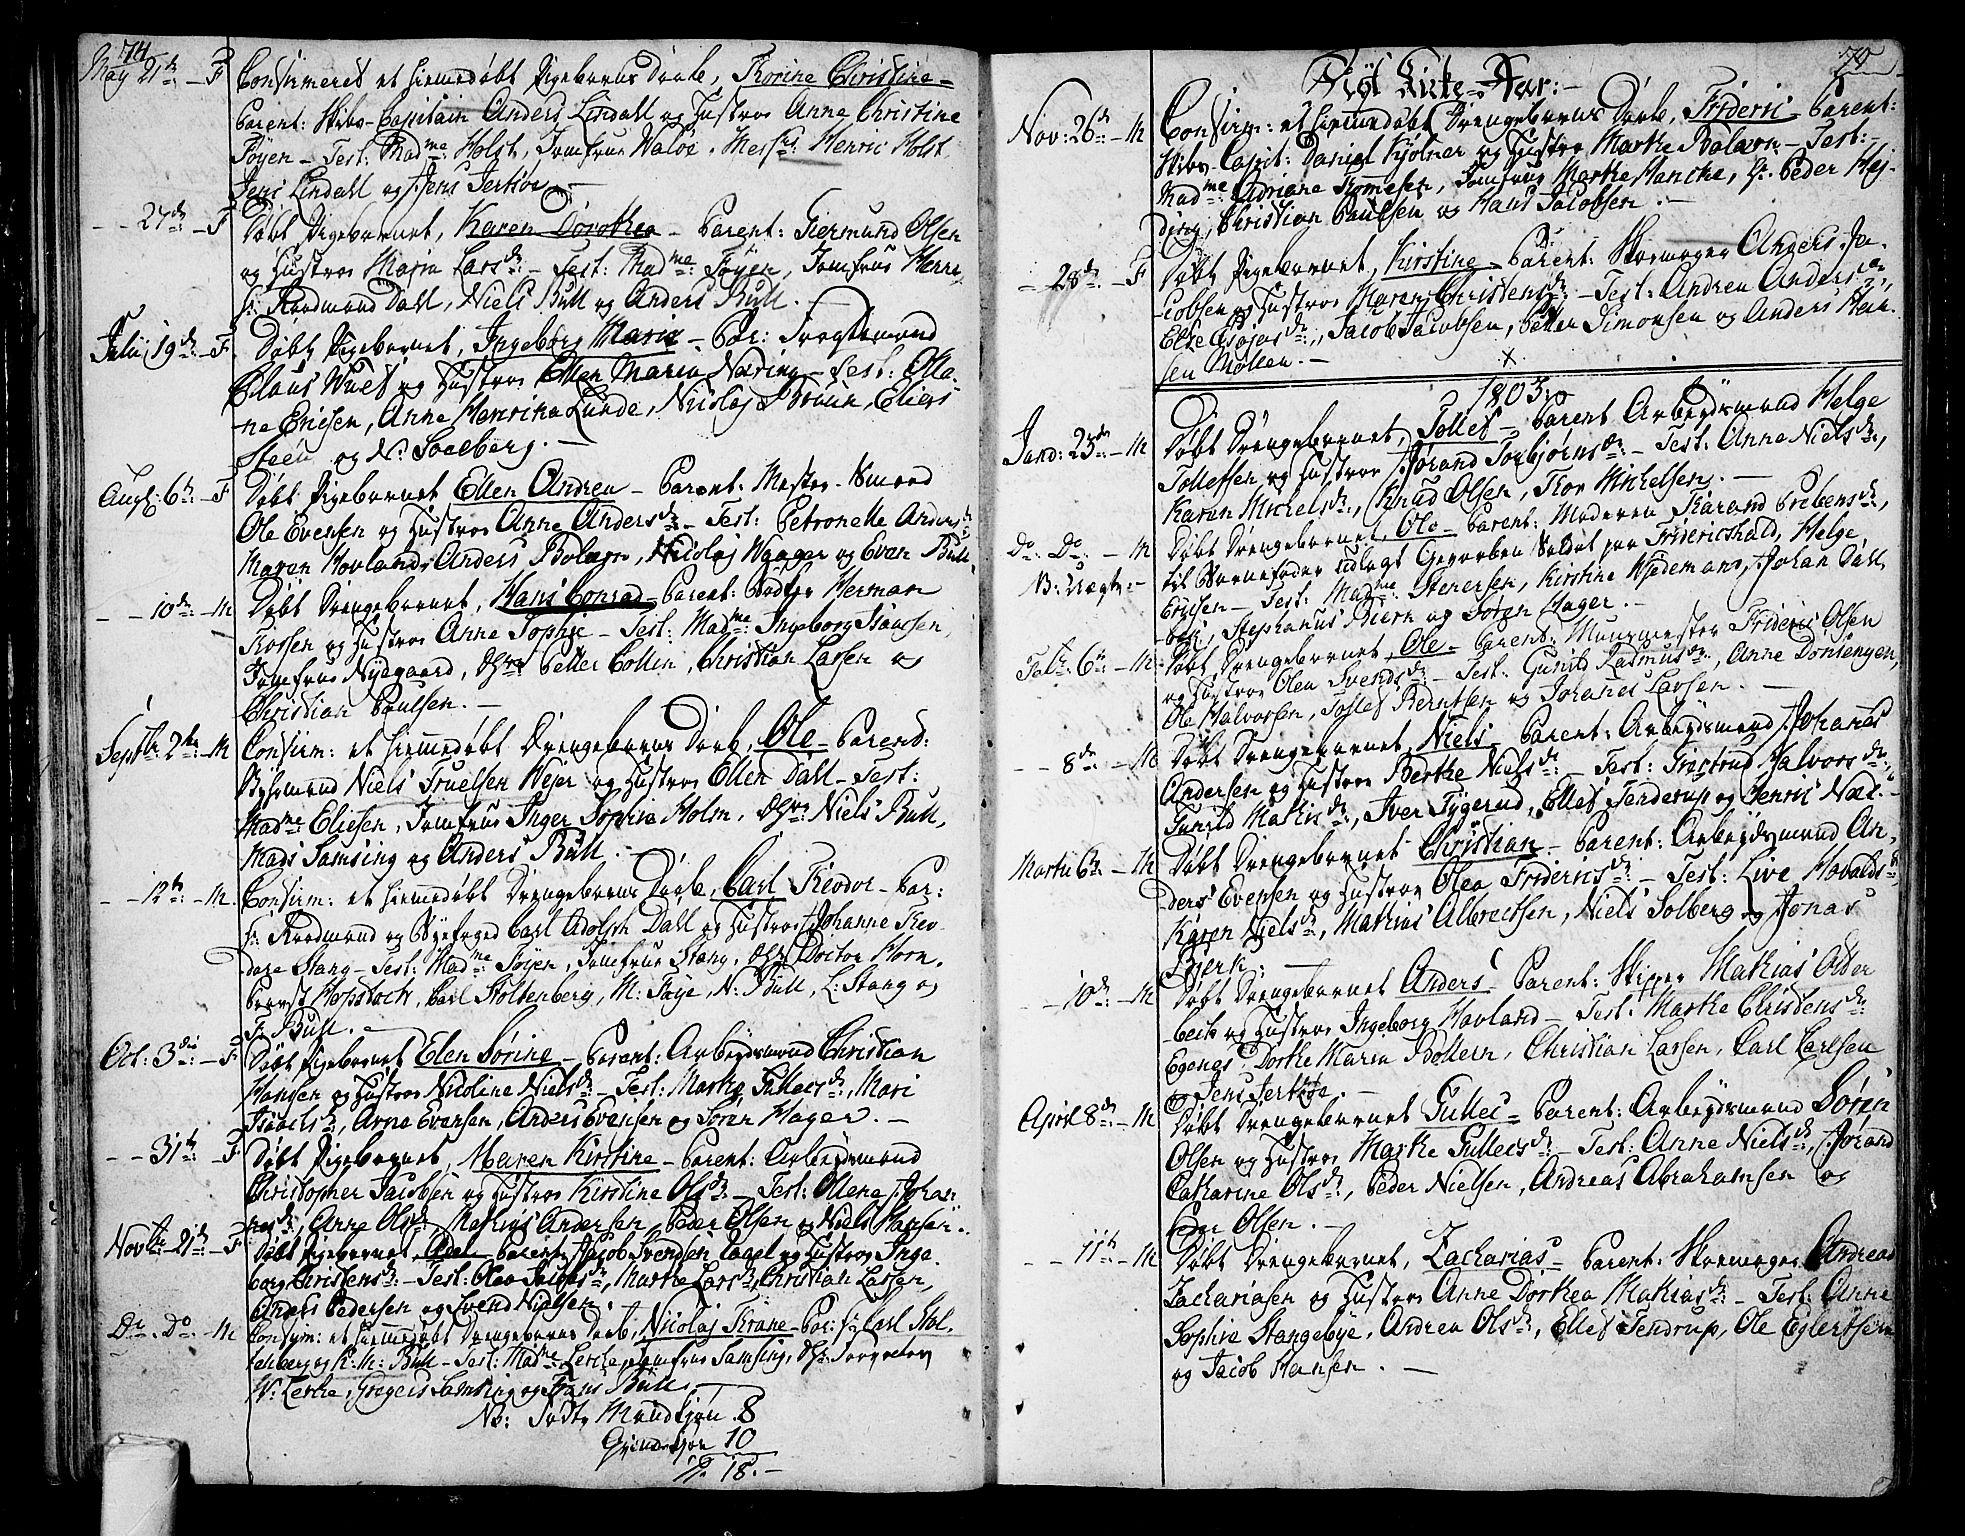 SAKO, Tønsberg kirkebøker, F/Fa/L0003: Ministerialbok nr. I 3, 1797-1814, s. 74-75